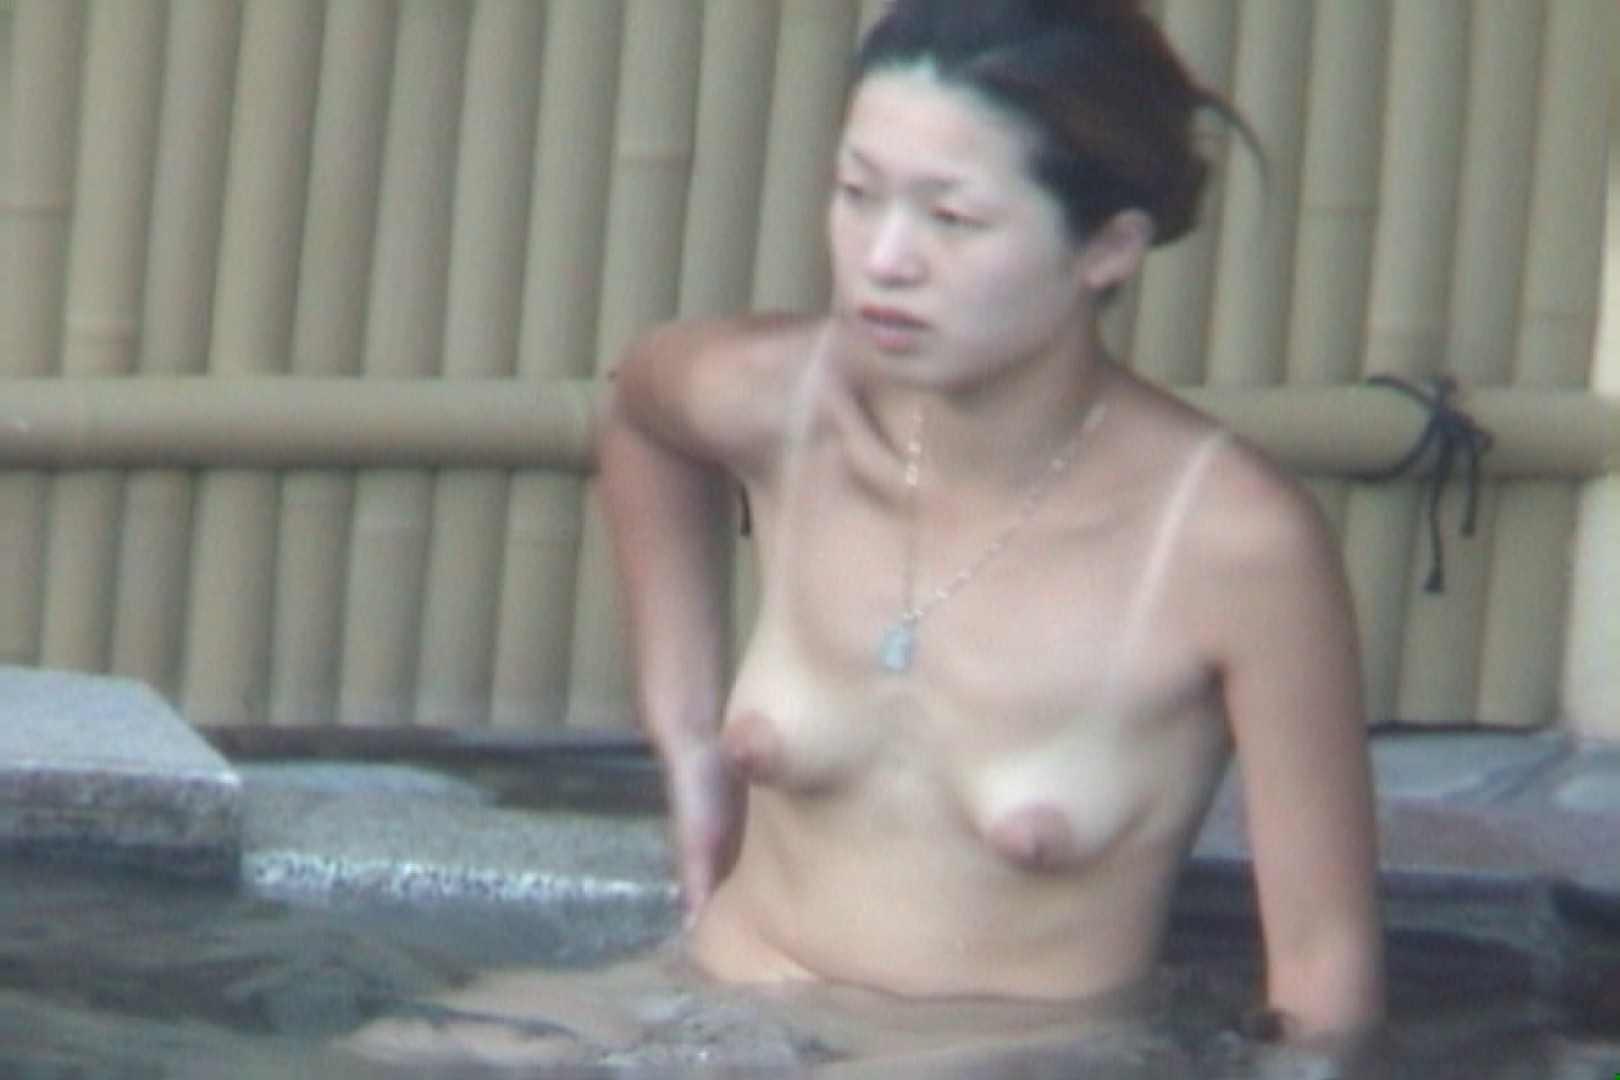 Aquaな露天風呂Vol.571 盗撮 | OLセックス  83画像 7